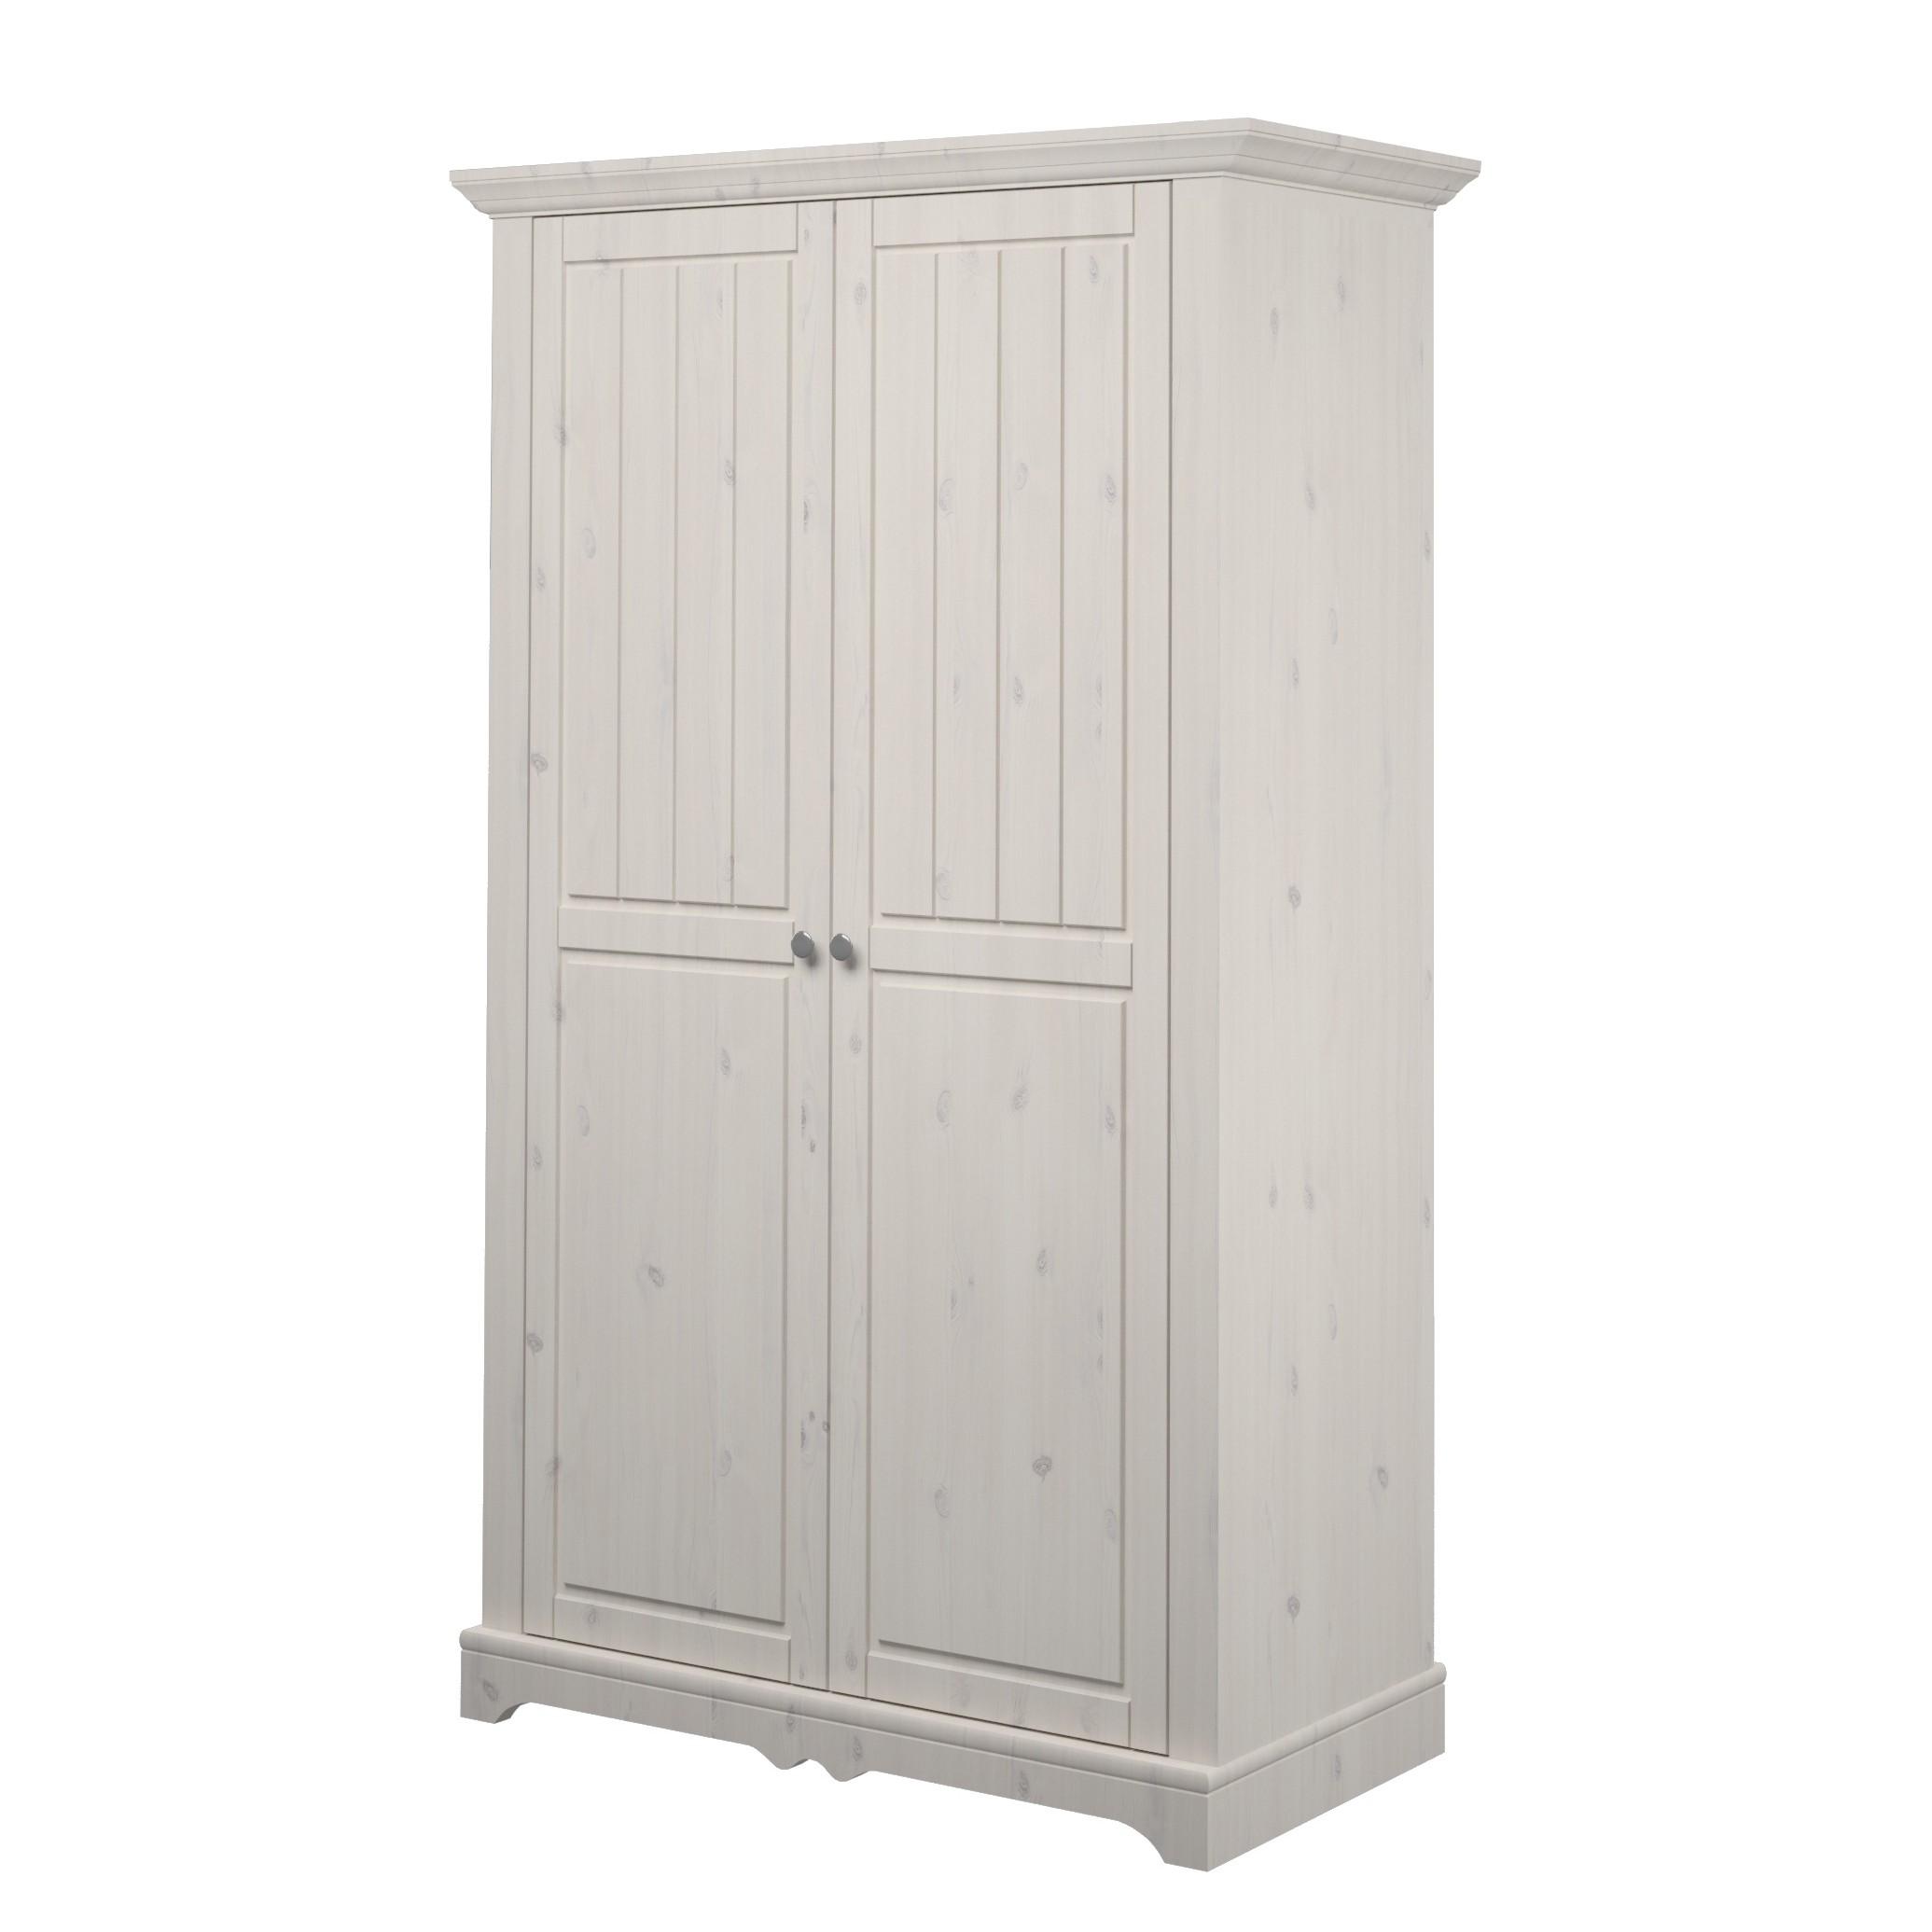 Kledingkast Karlotta 2 deurs   grenenhout white wash   White Washed_ Steens